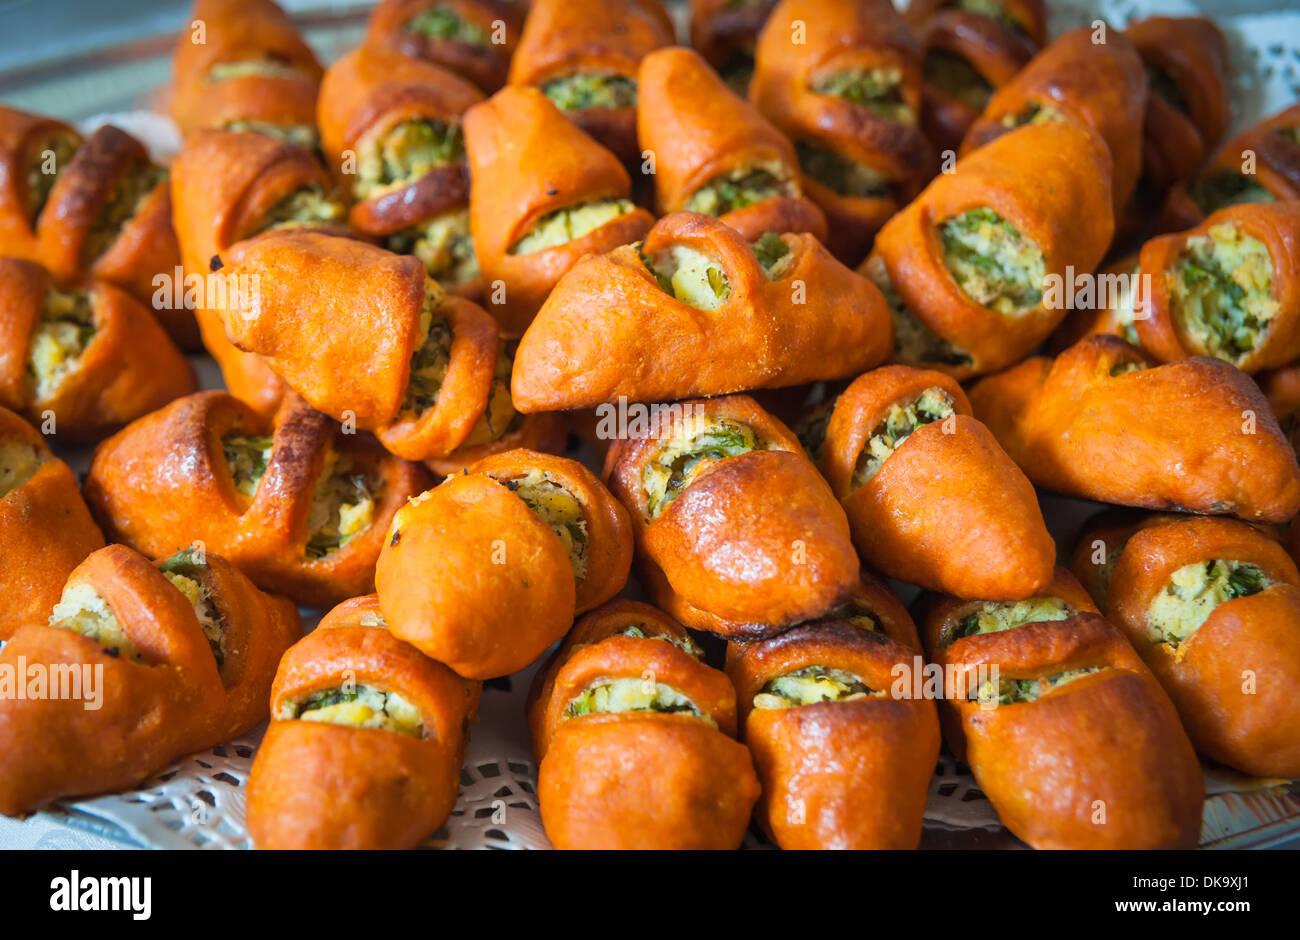 Delicious Turkish pogaca savory mashed patatoes pastry Stock Photo